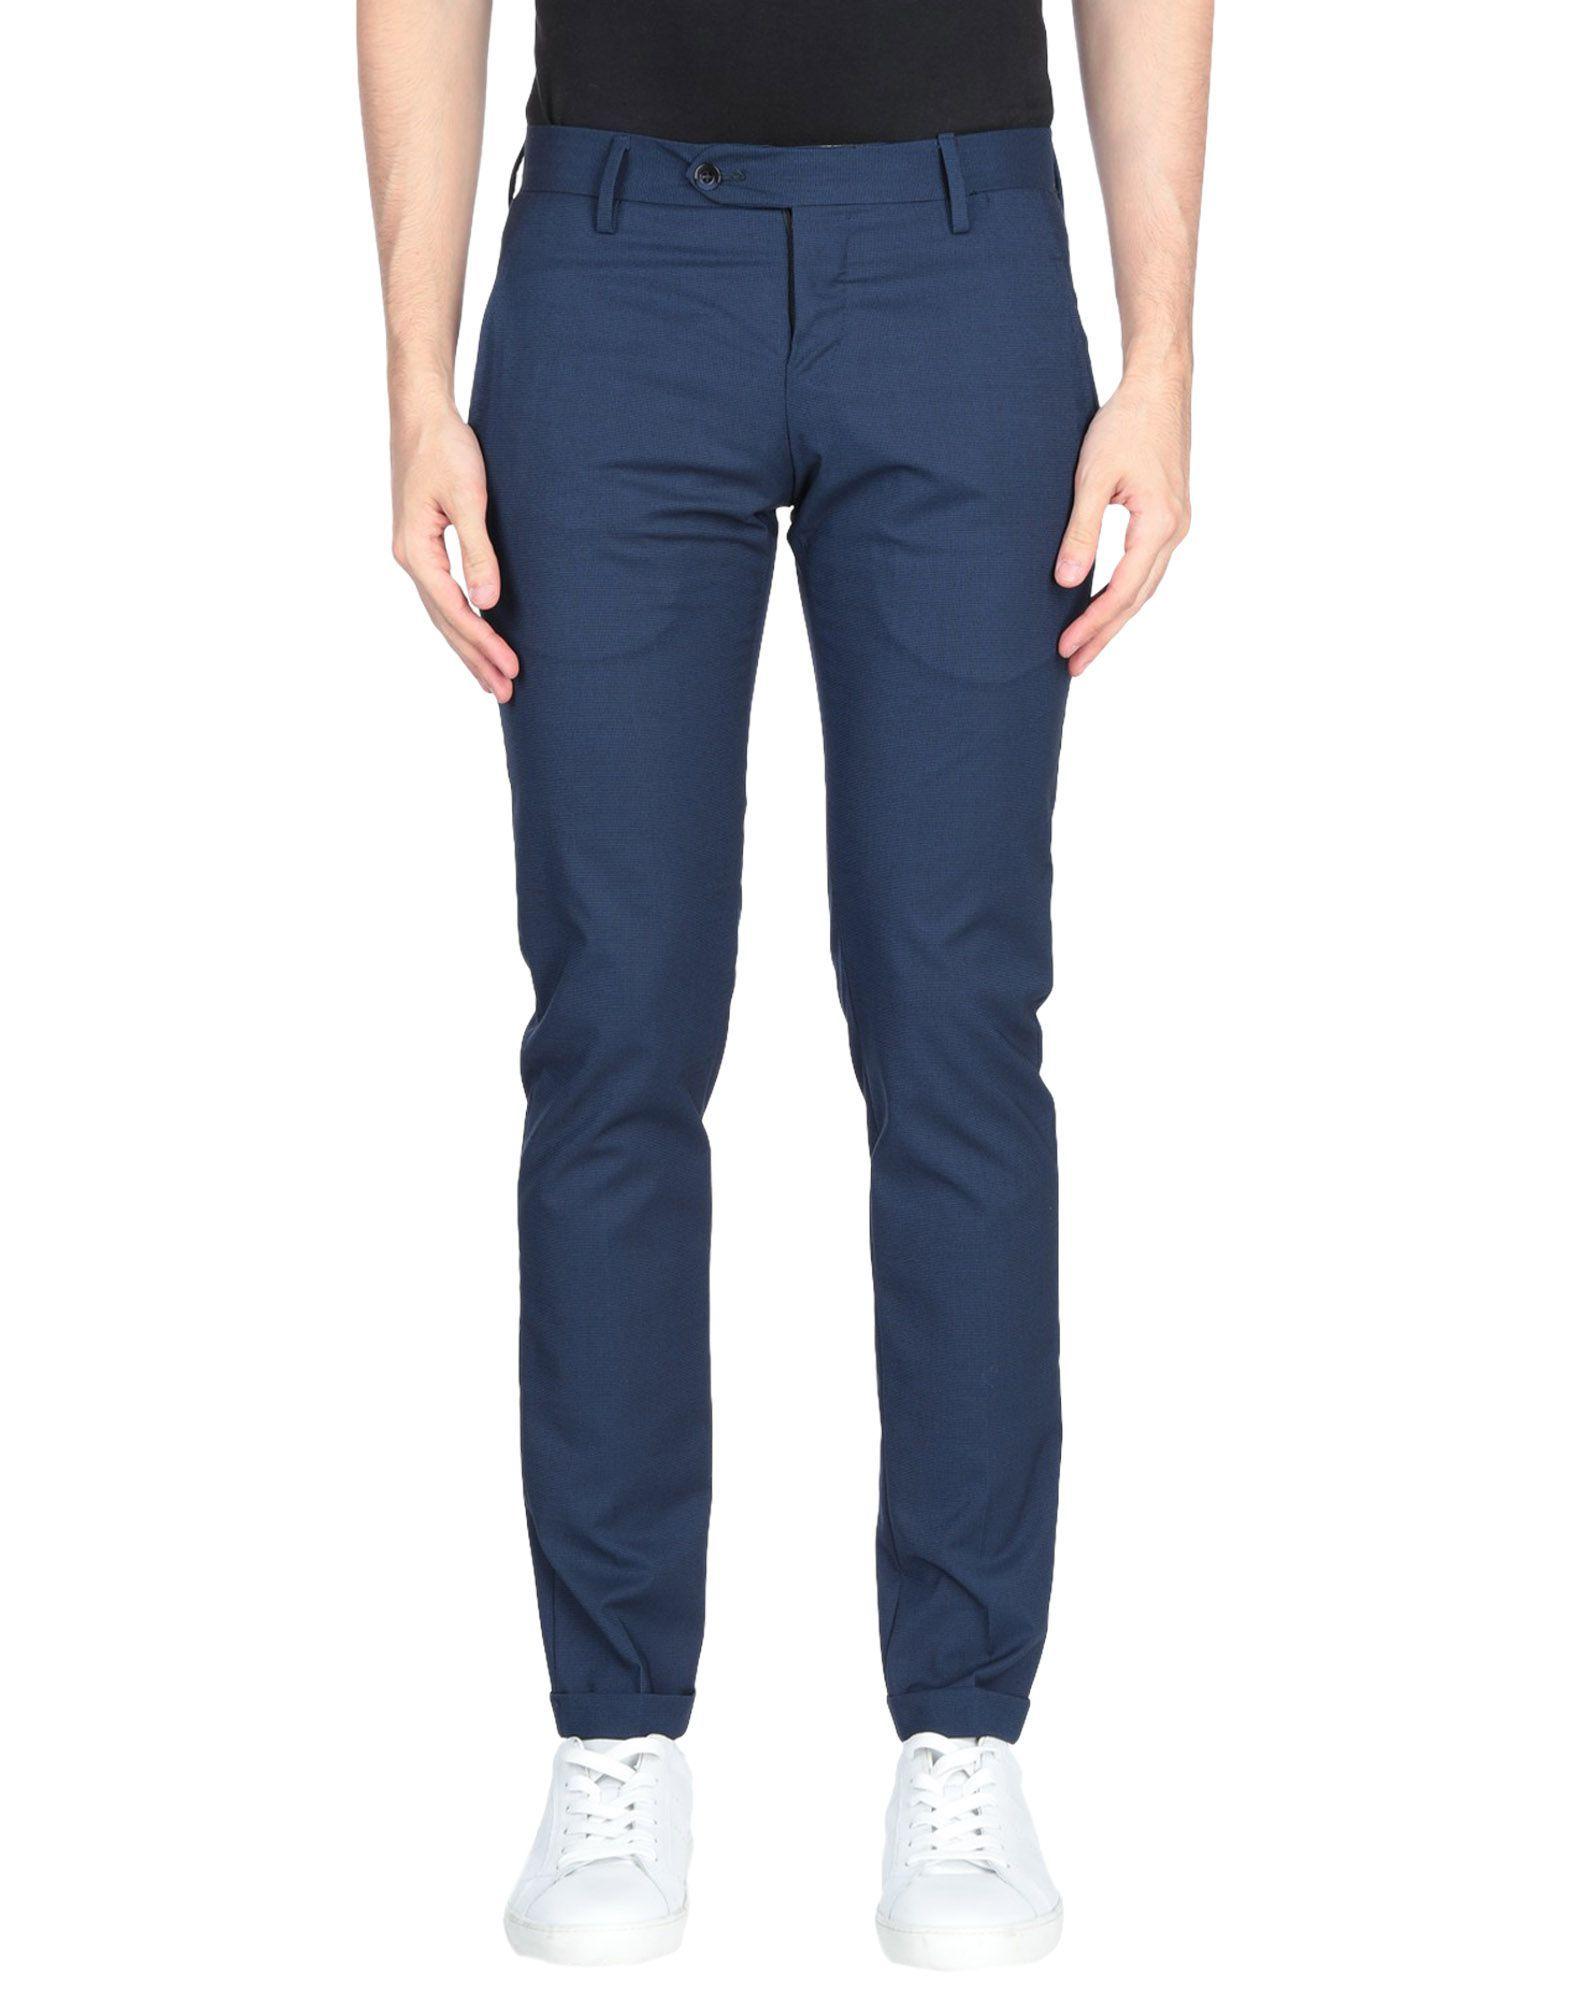 Michael Coal Dark Blue Trousers